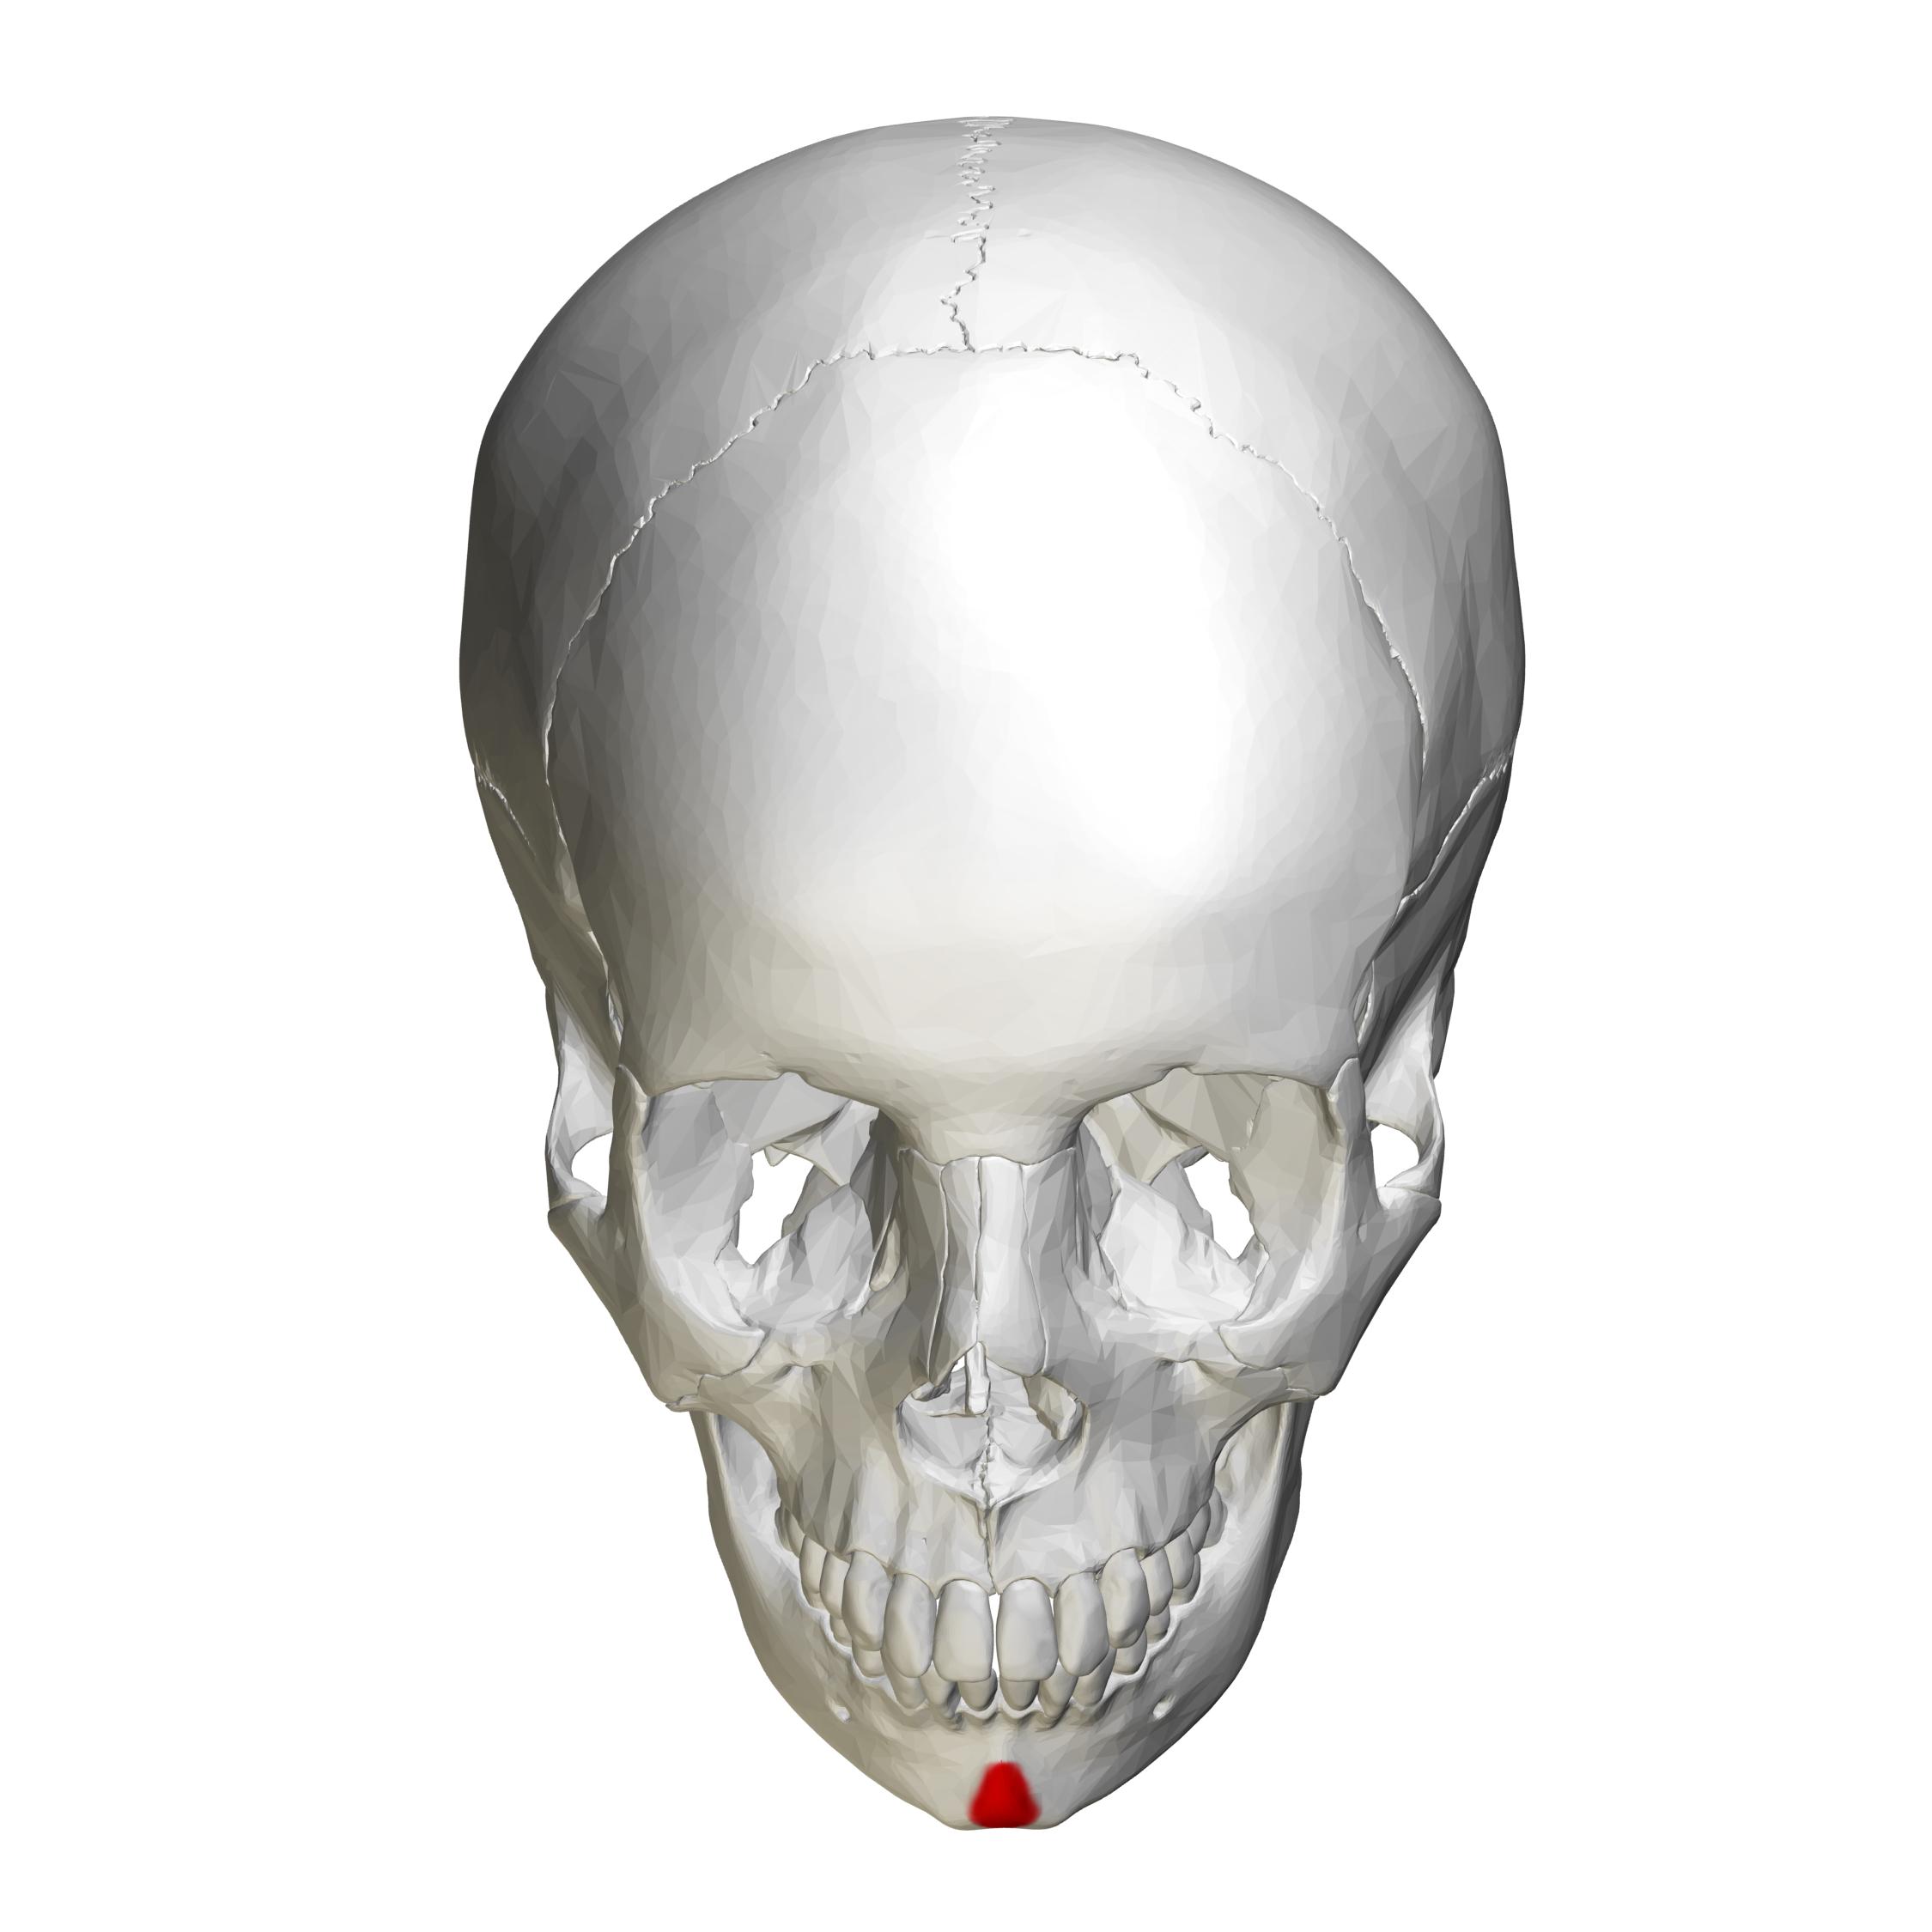 File:Mental protuberance - skull - anterior view02.png - Wikimedia ...